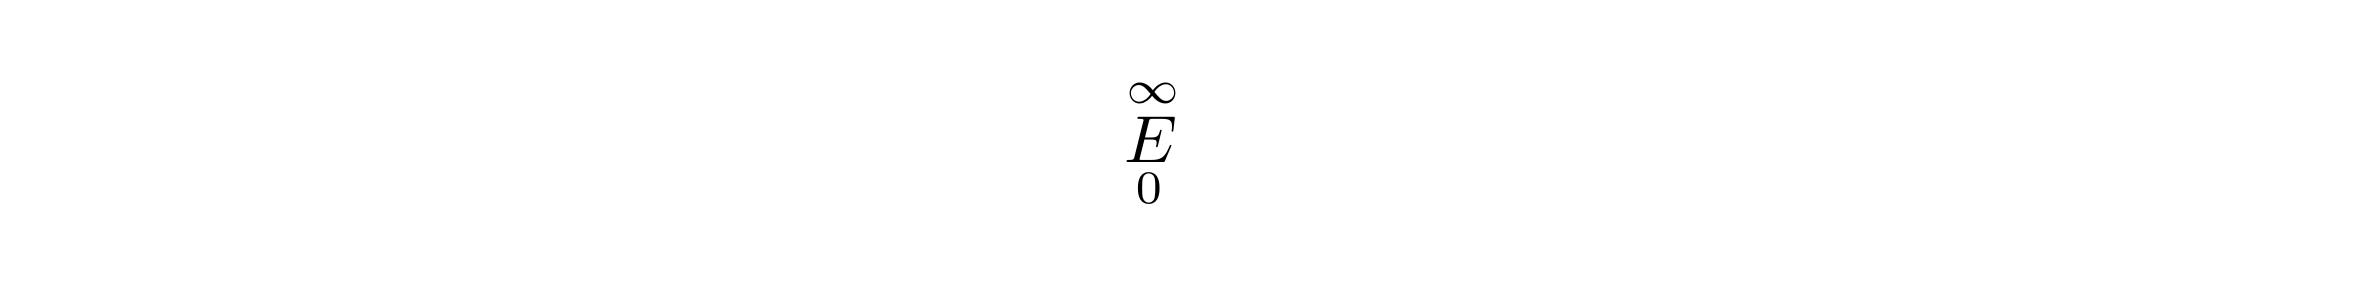 mathop-E.png